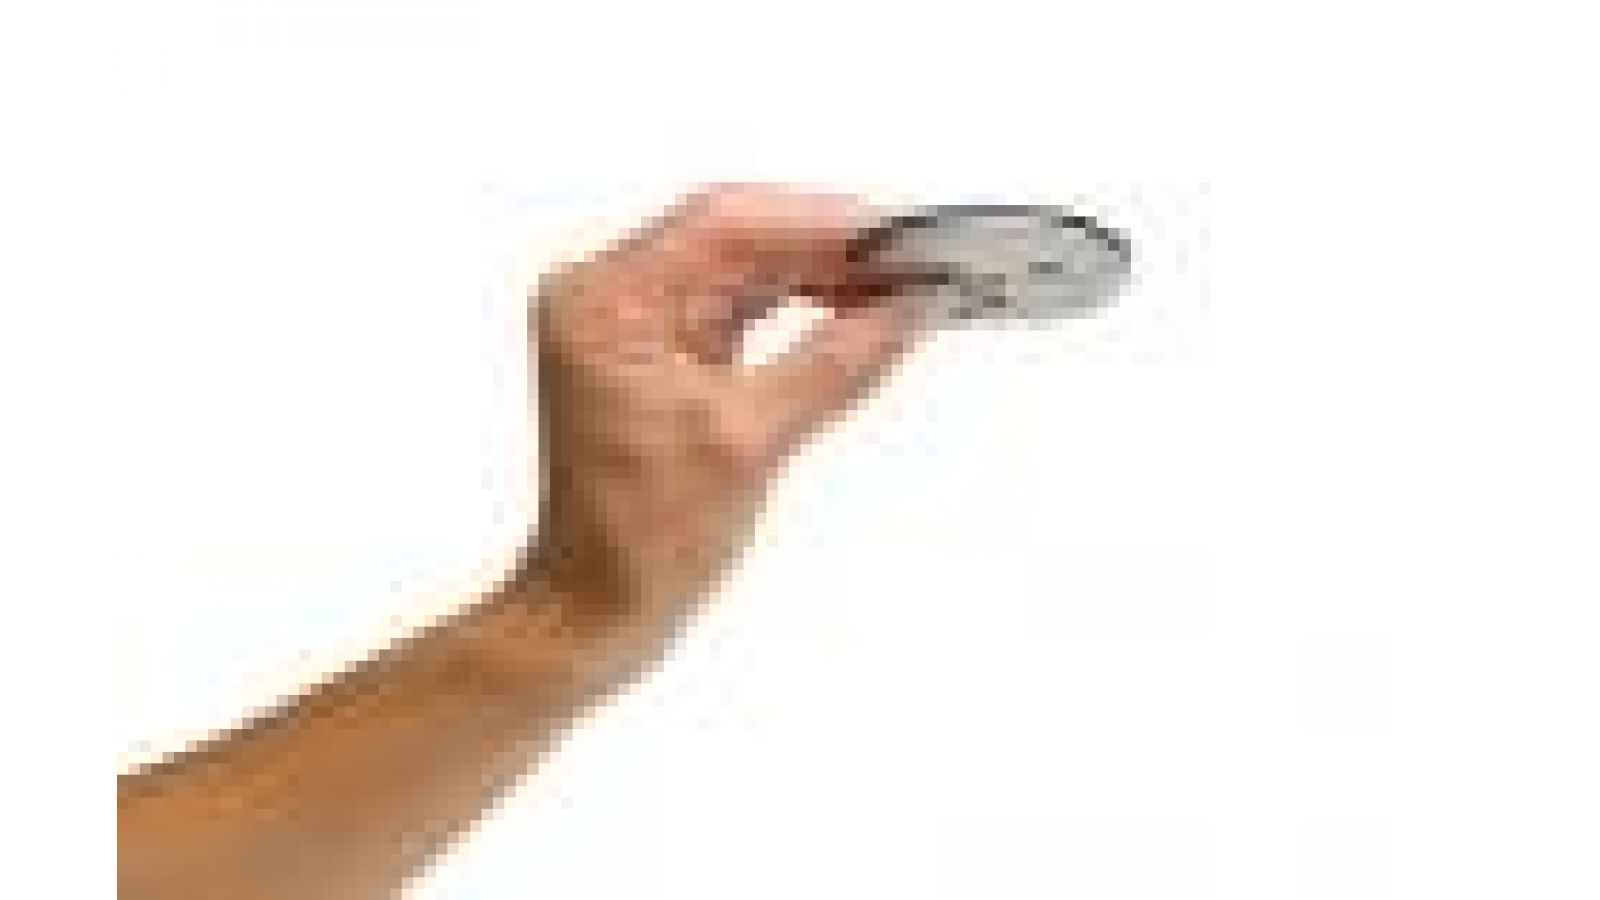 Kichler Lighting Systems Design Pro Discs